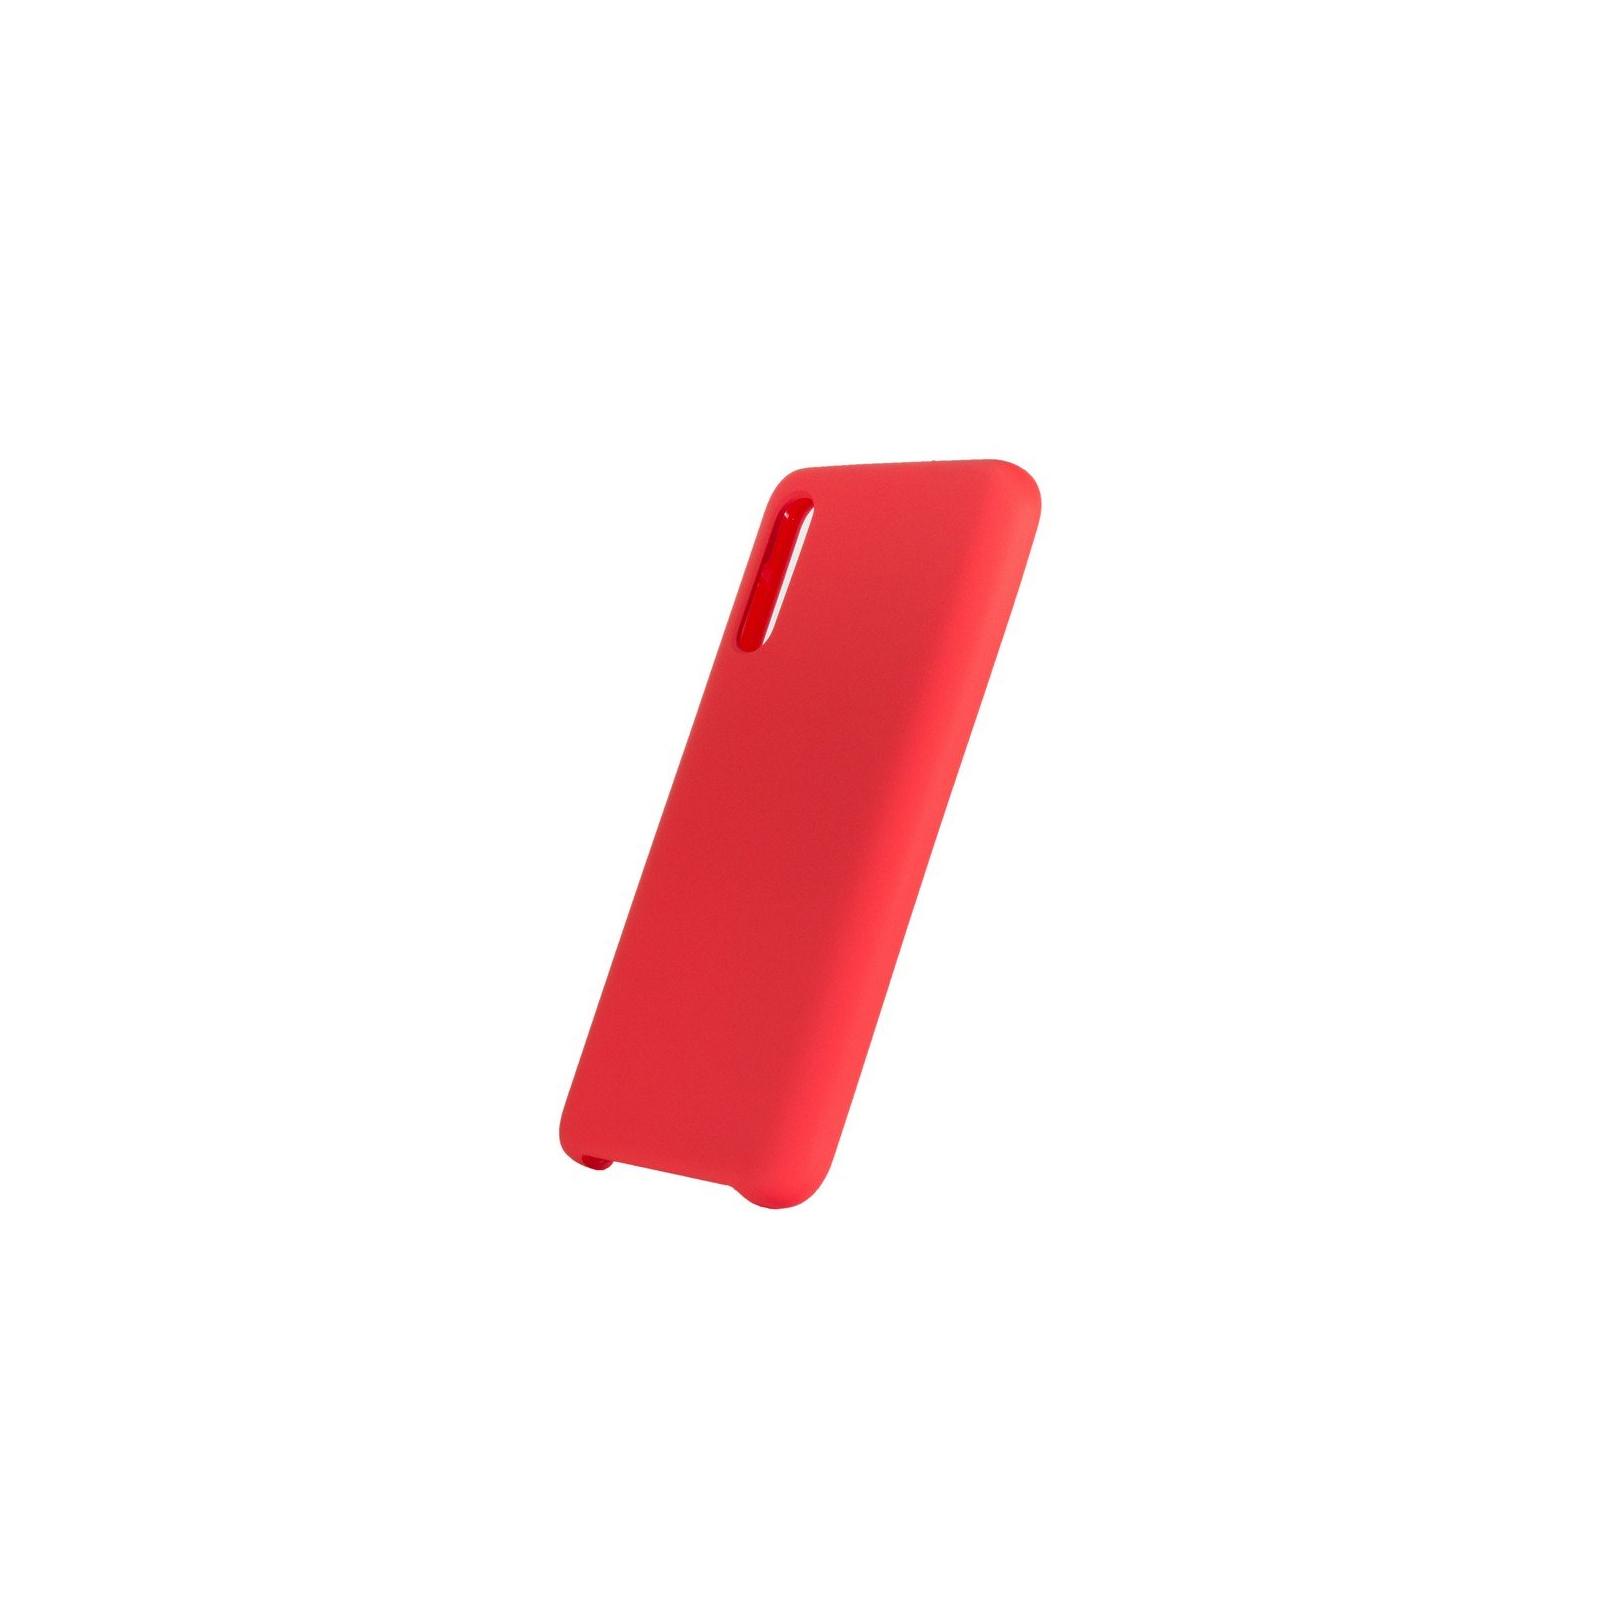 Чехол для моб. телефона ColorWay ColorWay Liquid Silicone для Samsung Galaxy A50 Yellow (CW-CLSSGA505-YL) изображение 3